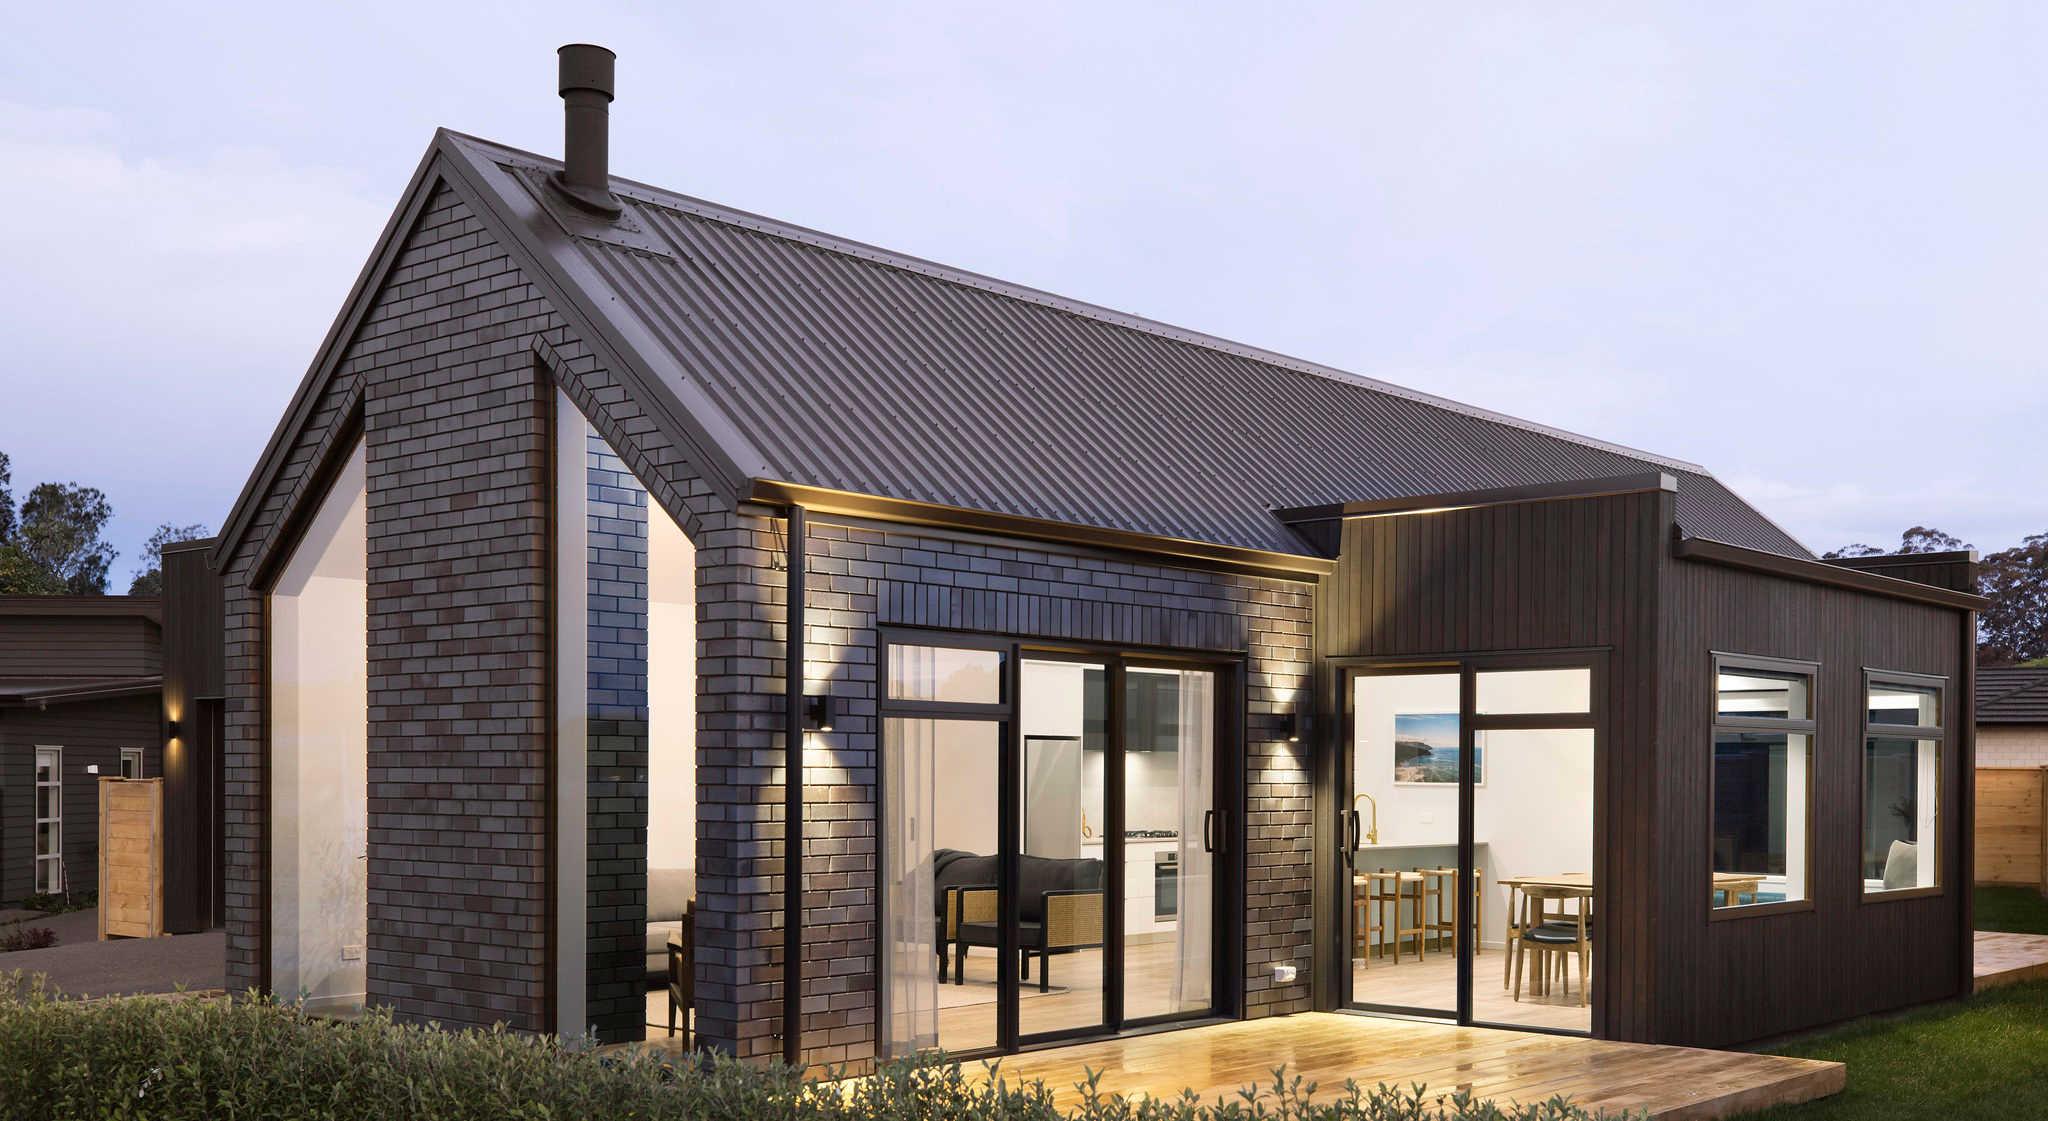 A Kiwi developer's brick show home embodies their unique approach